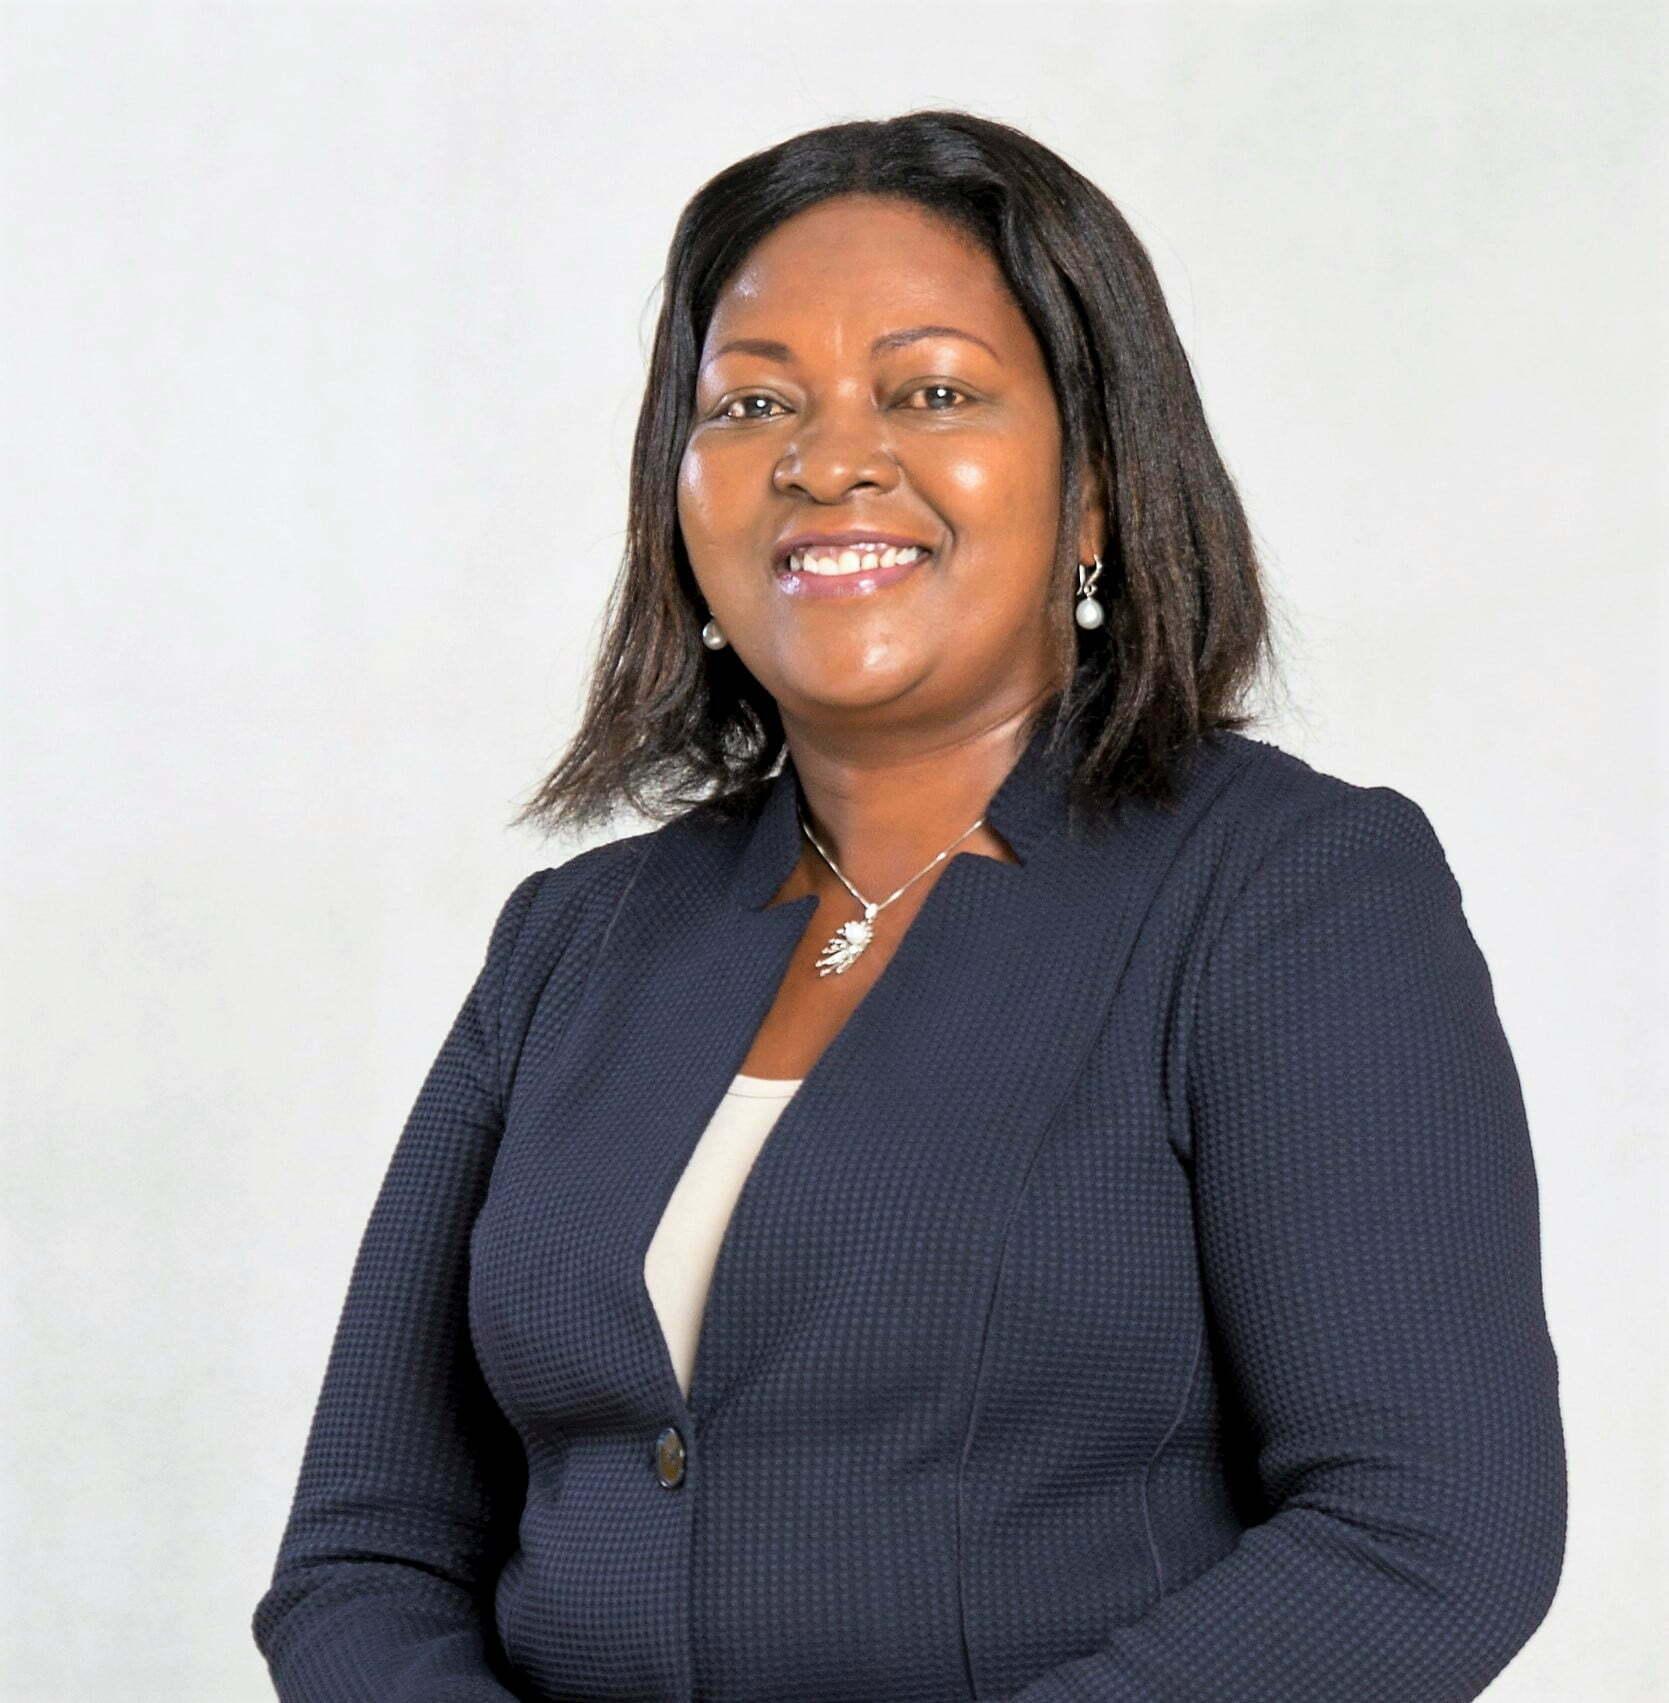 Mary Wangari Wamae